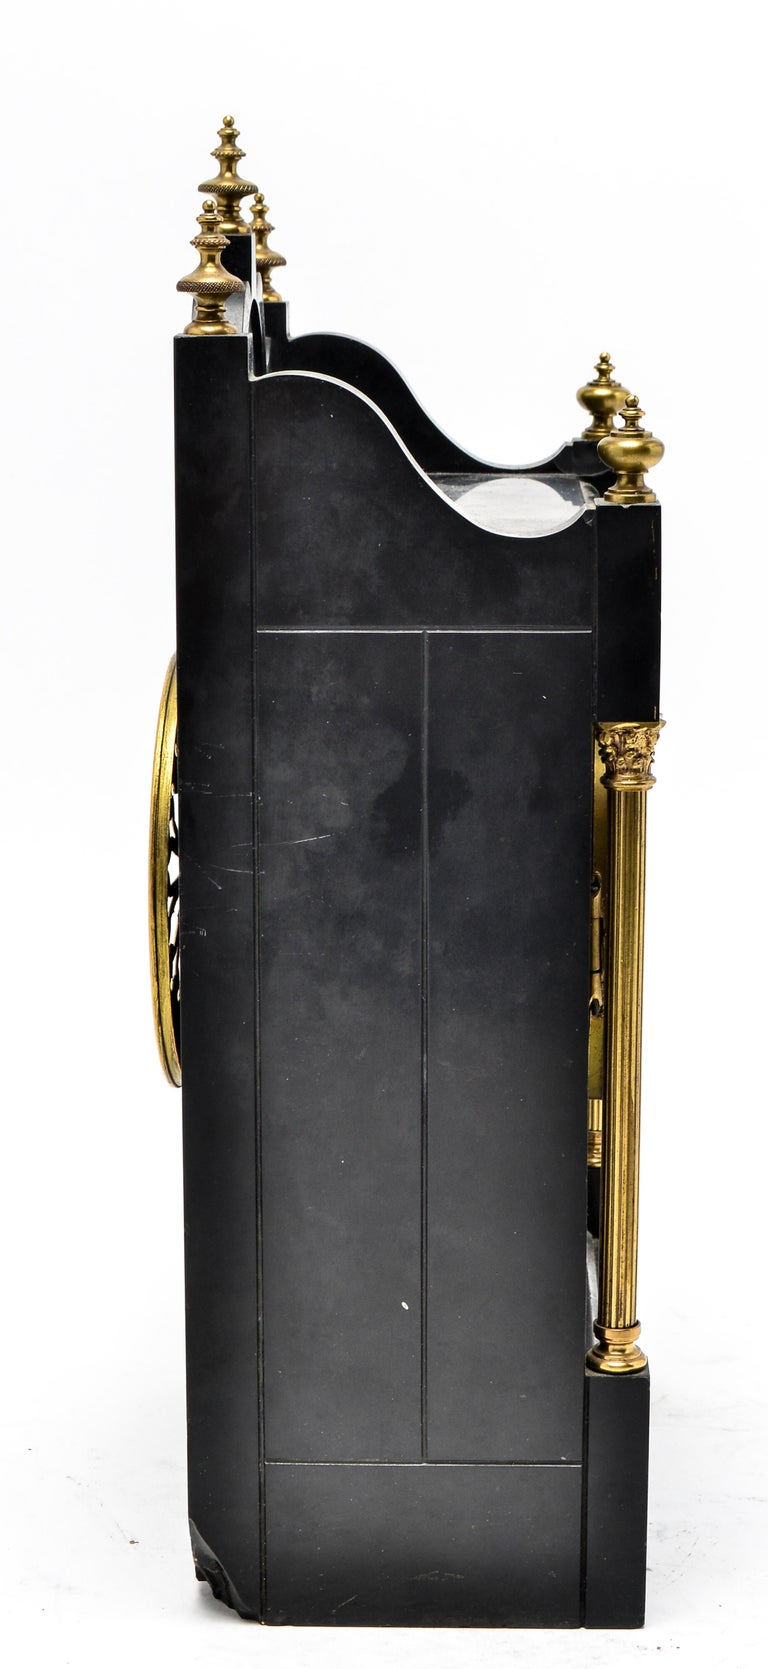 Eastlake Mantel Clock in Black Marble and Enamel For Sale 3